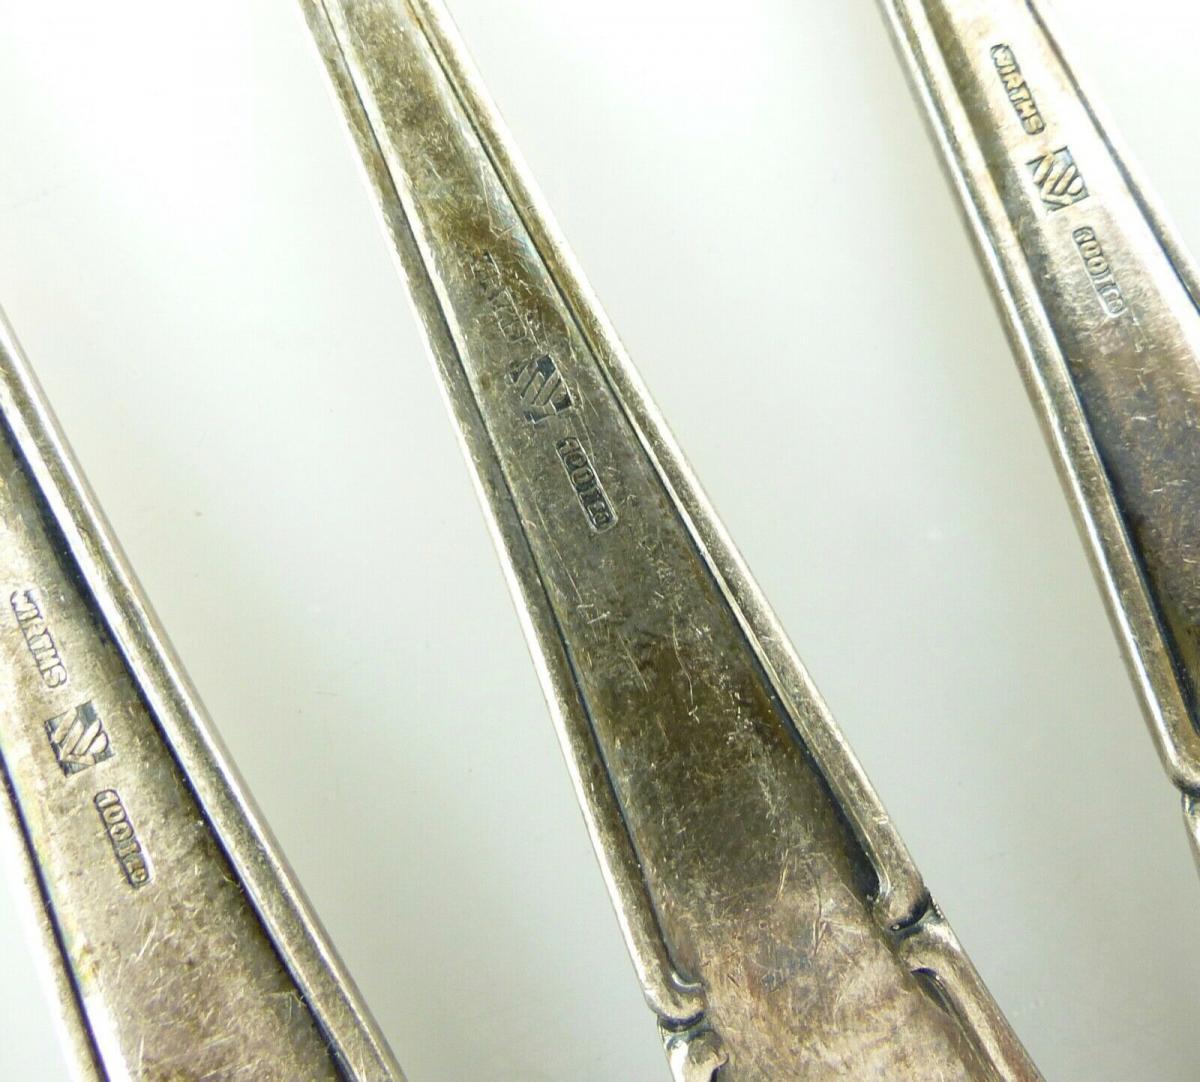 E11187 12 versilberte Kuchengabeln in 100er Silberauflage 4